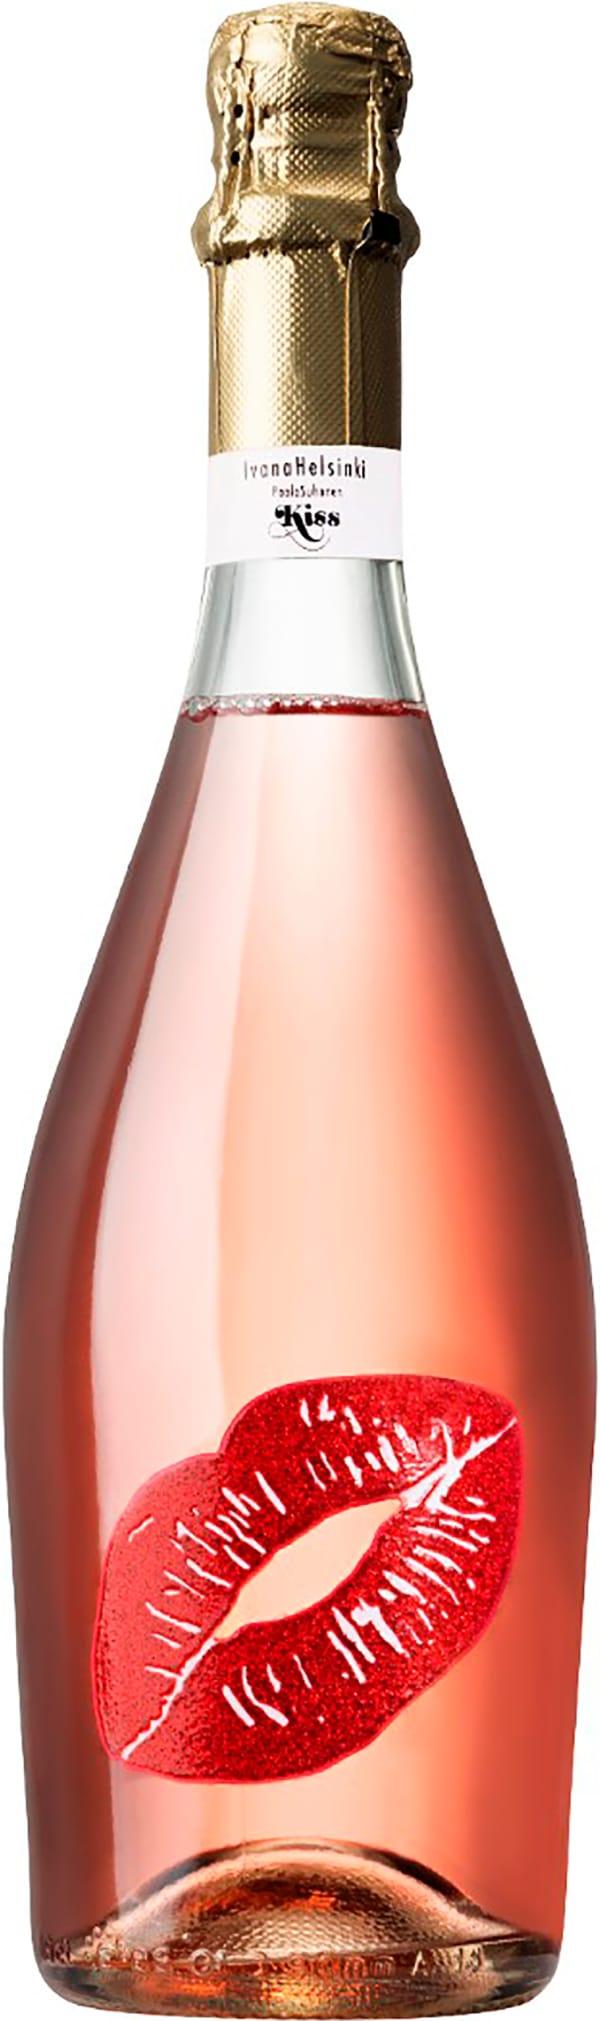 Ivana Helsinki Kiss Prosecco Rosé Extra Dry 2020